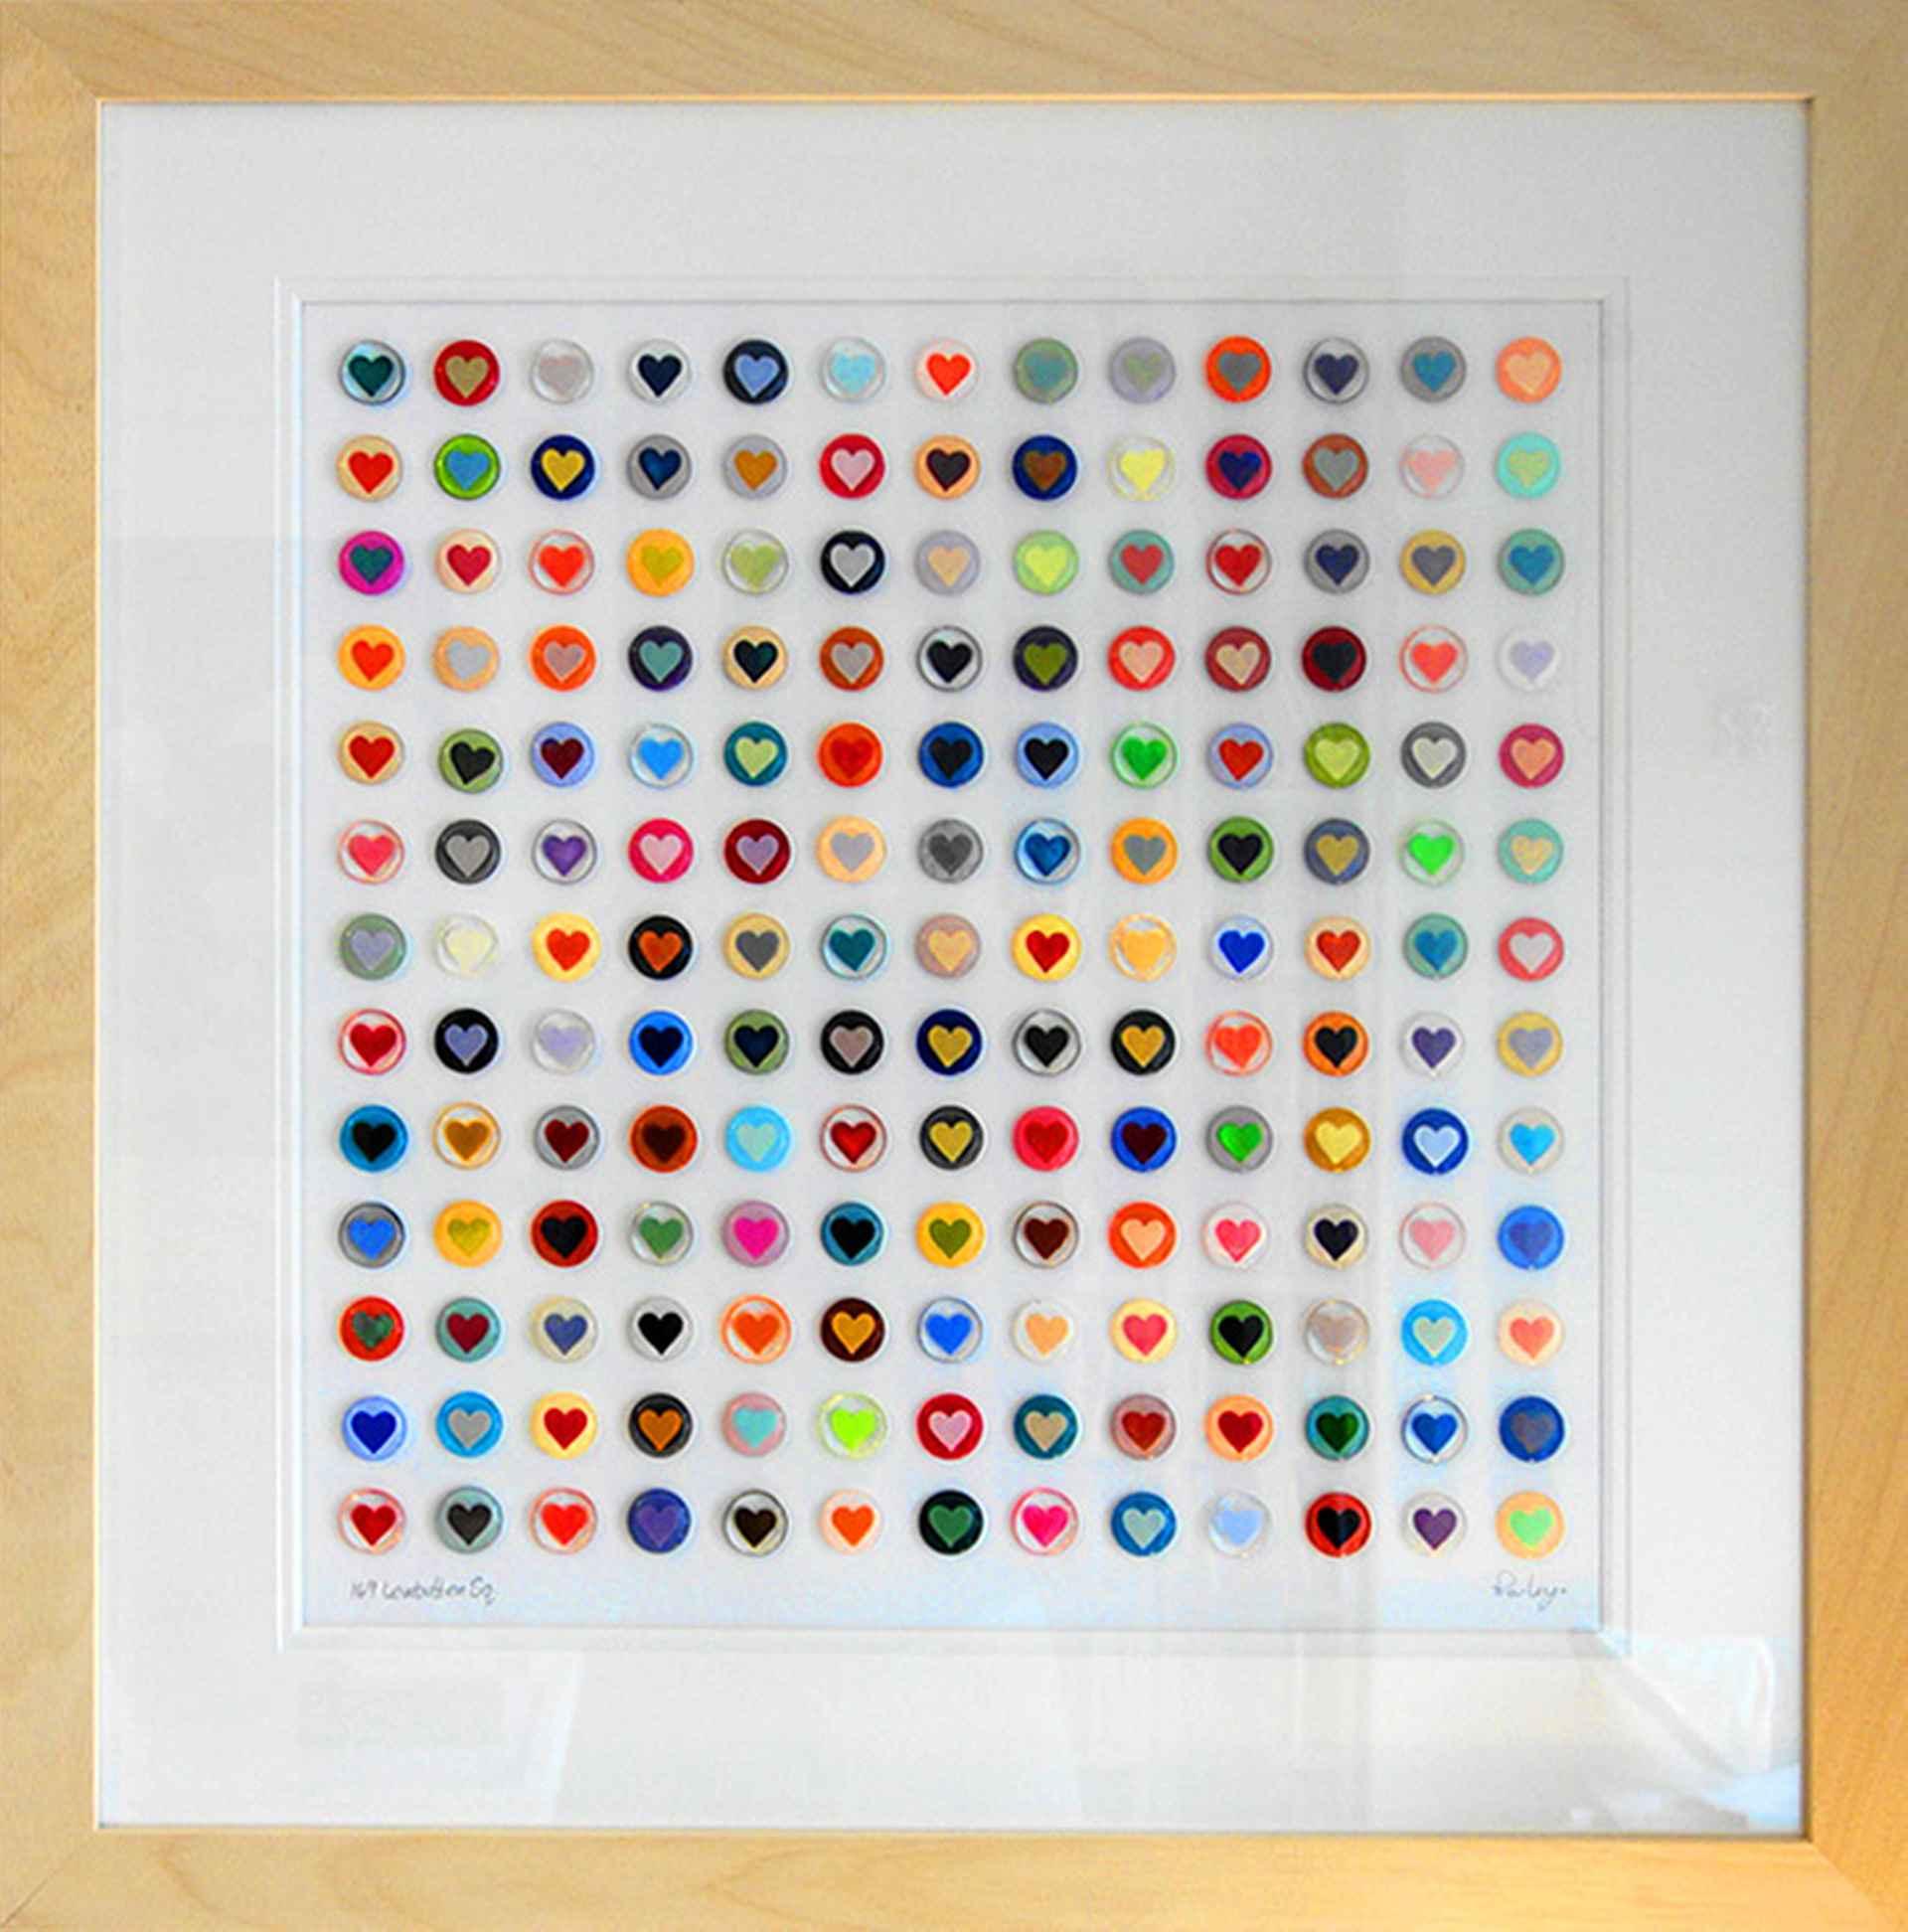 169 Lovebutton Square by Stephen Farley